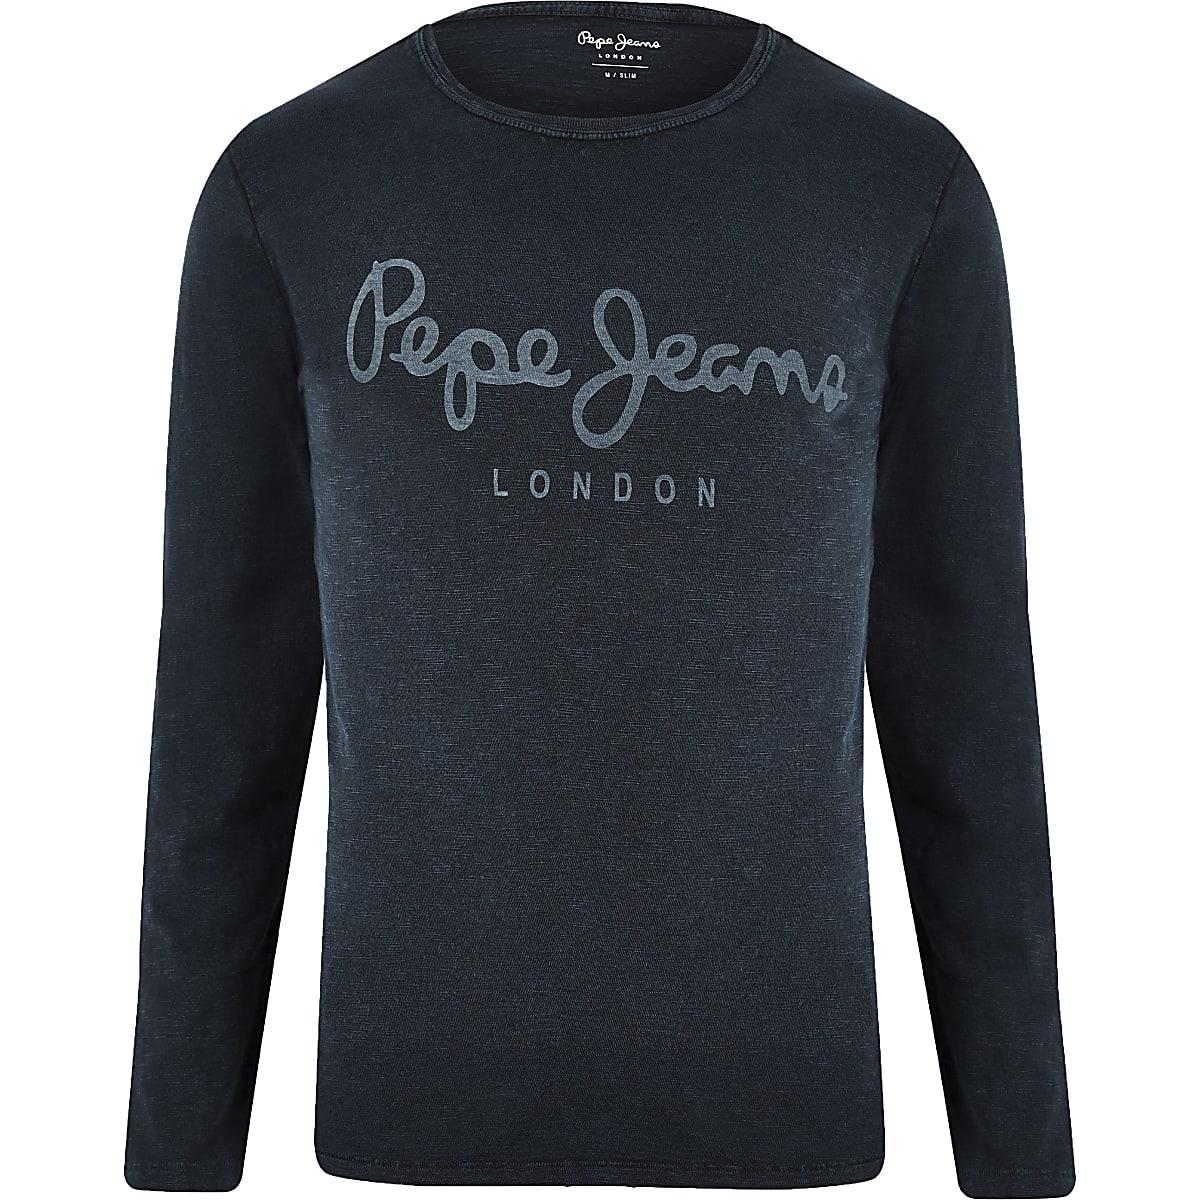 c3d5f093c0 Pepe Jeans blue long sleeve T-shirt - Long Sleeve T-Shirts - T ...